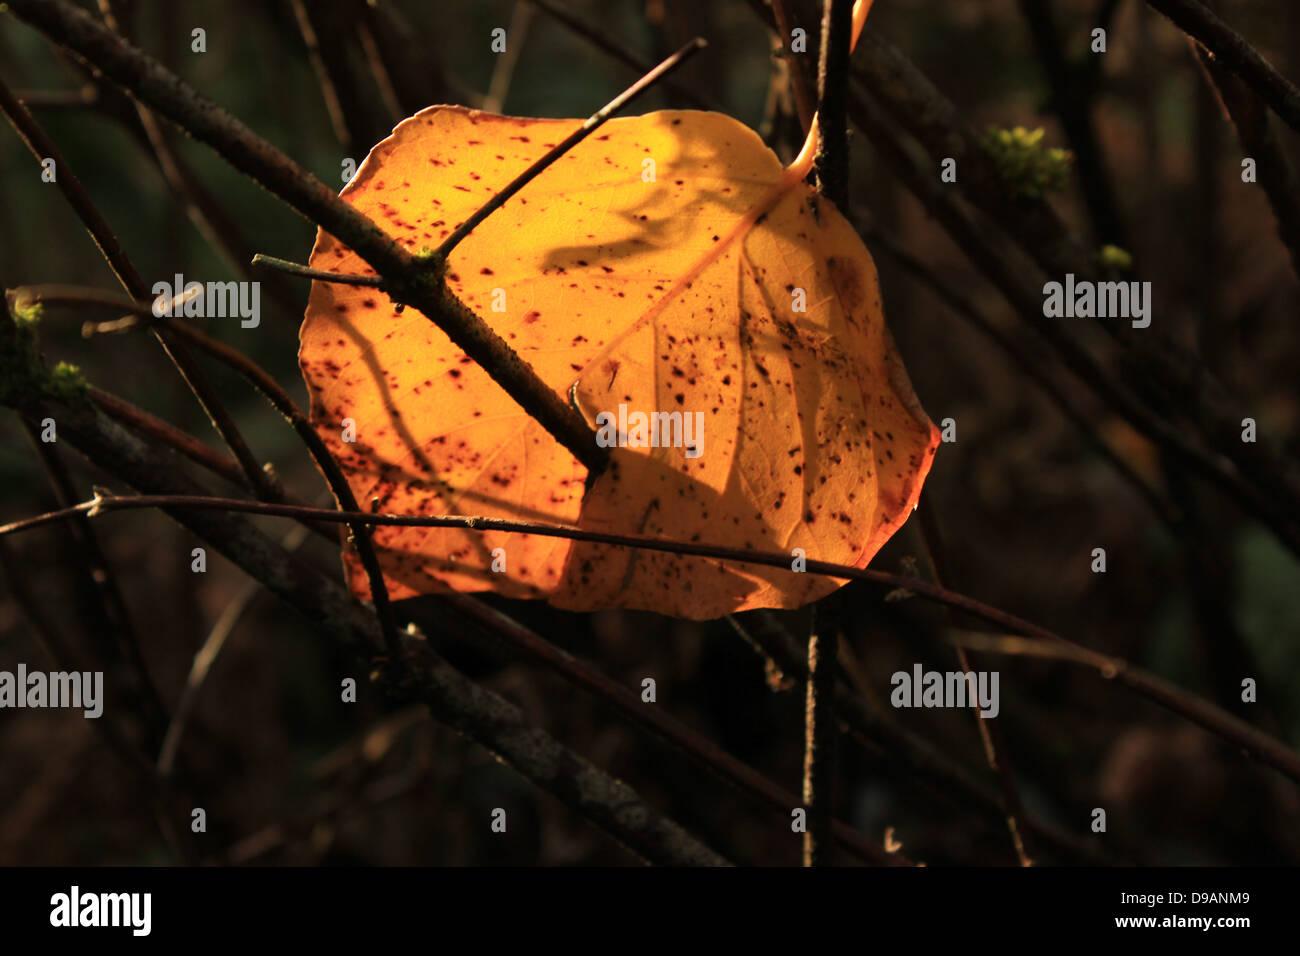 Speared immagini & speared fotos stock alamy